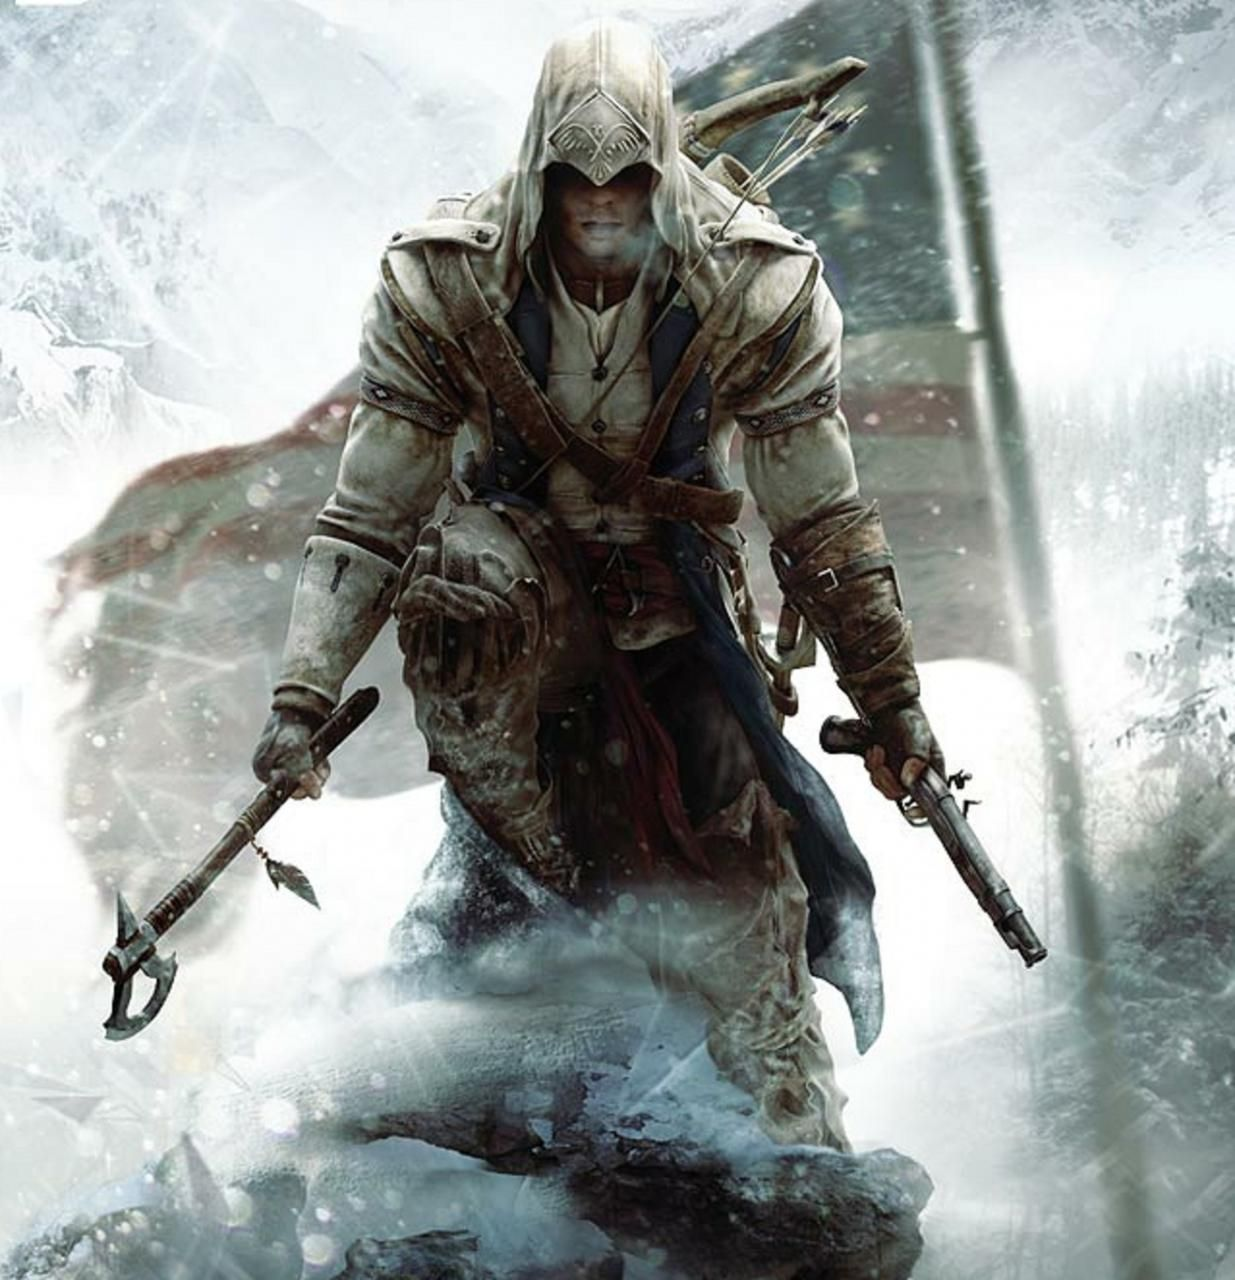 Assassins Creed Iii Connor Assassin S Creed 3 Assassins Creed